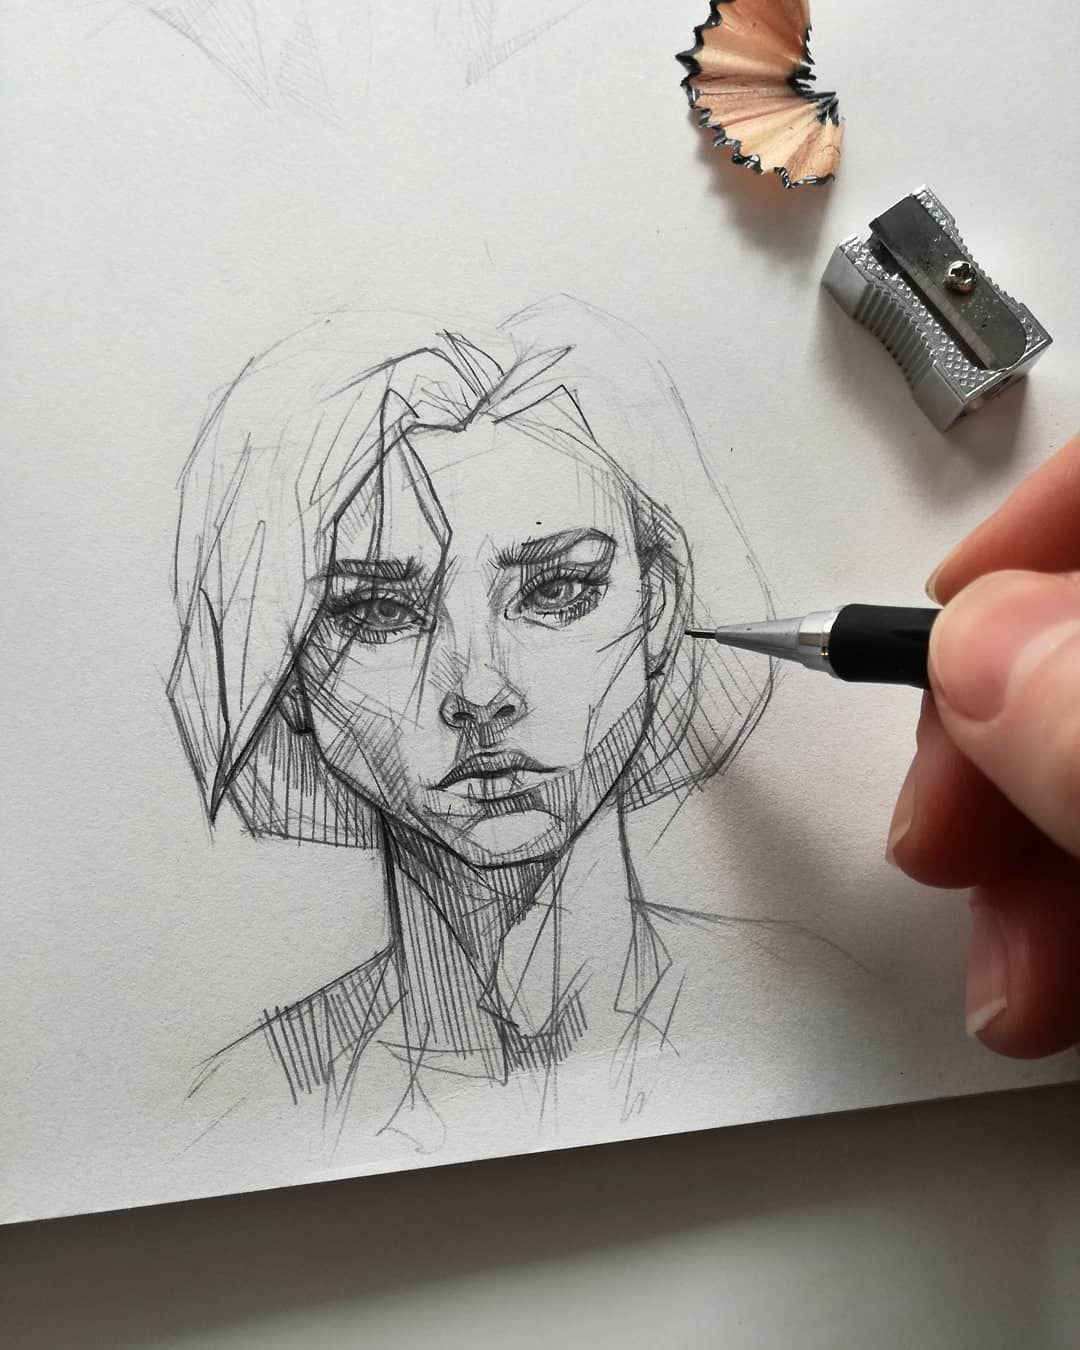 #Ani #Artist #Cinski #Pencil #Sketch Ani Cinski is a German pencil sketch artist...